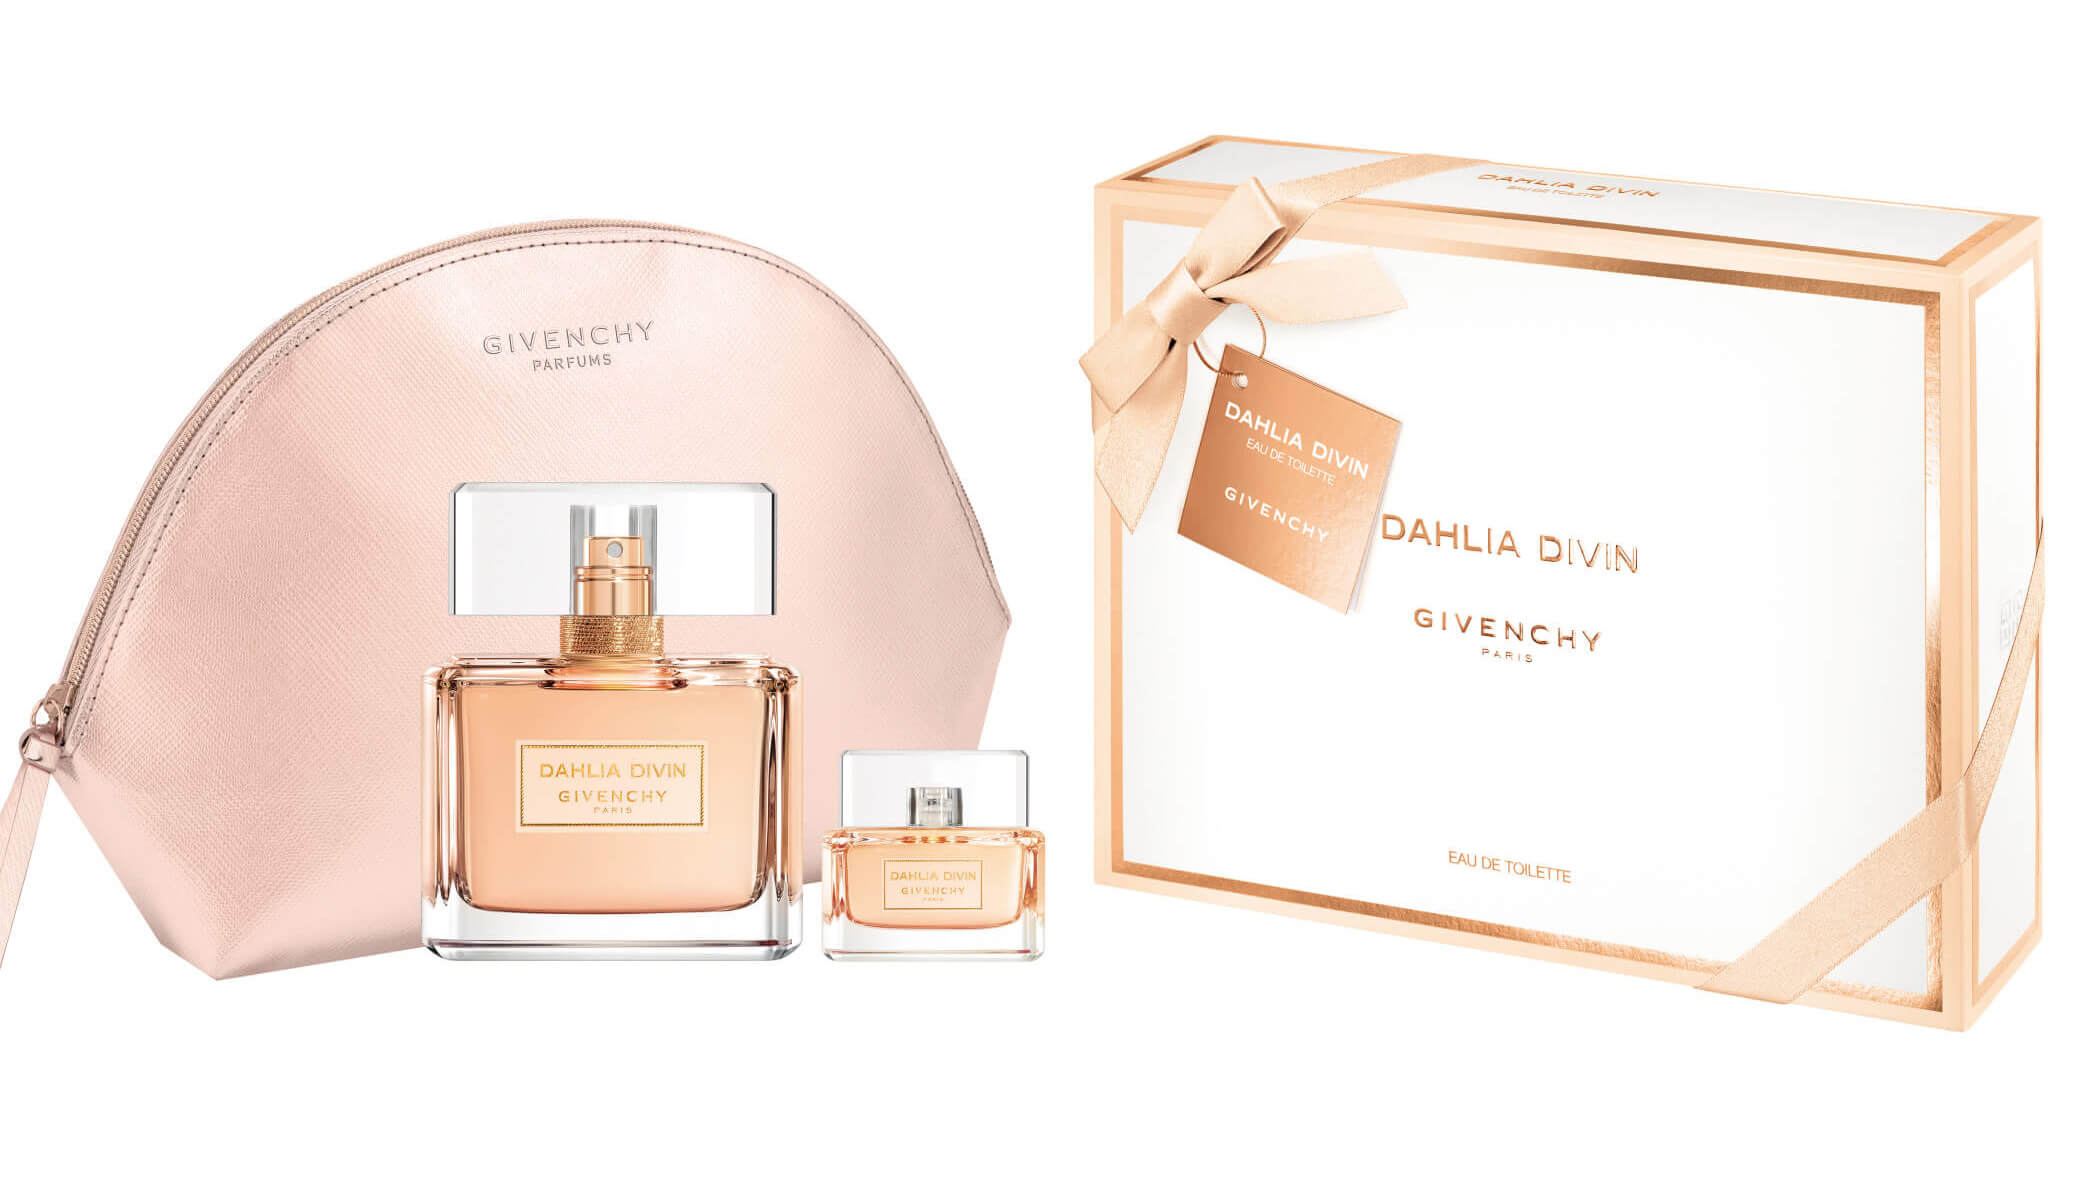 Perfume Dahlia Divin Givenchy